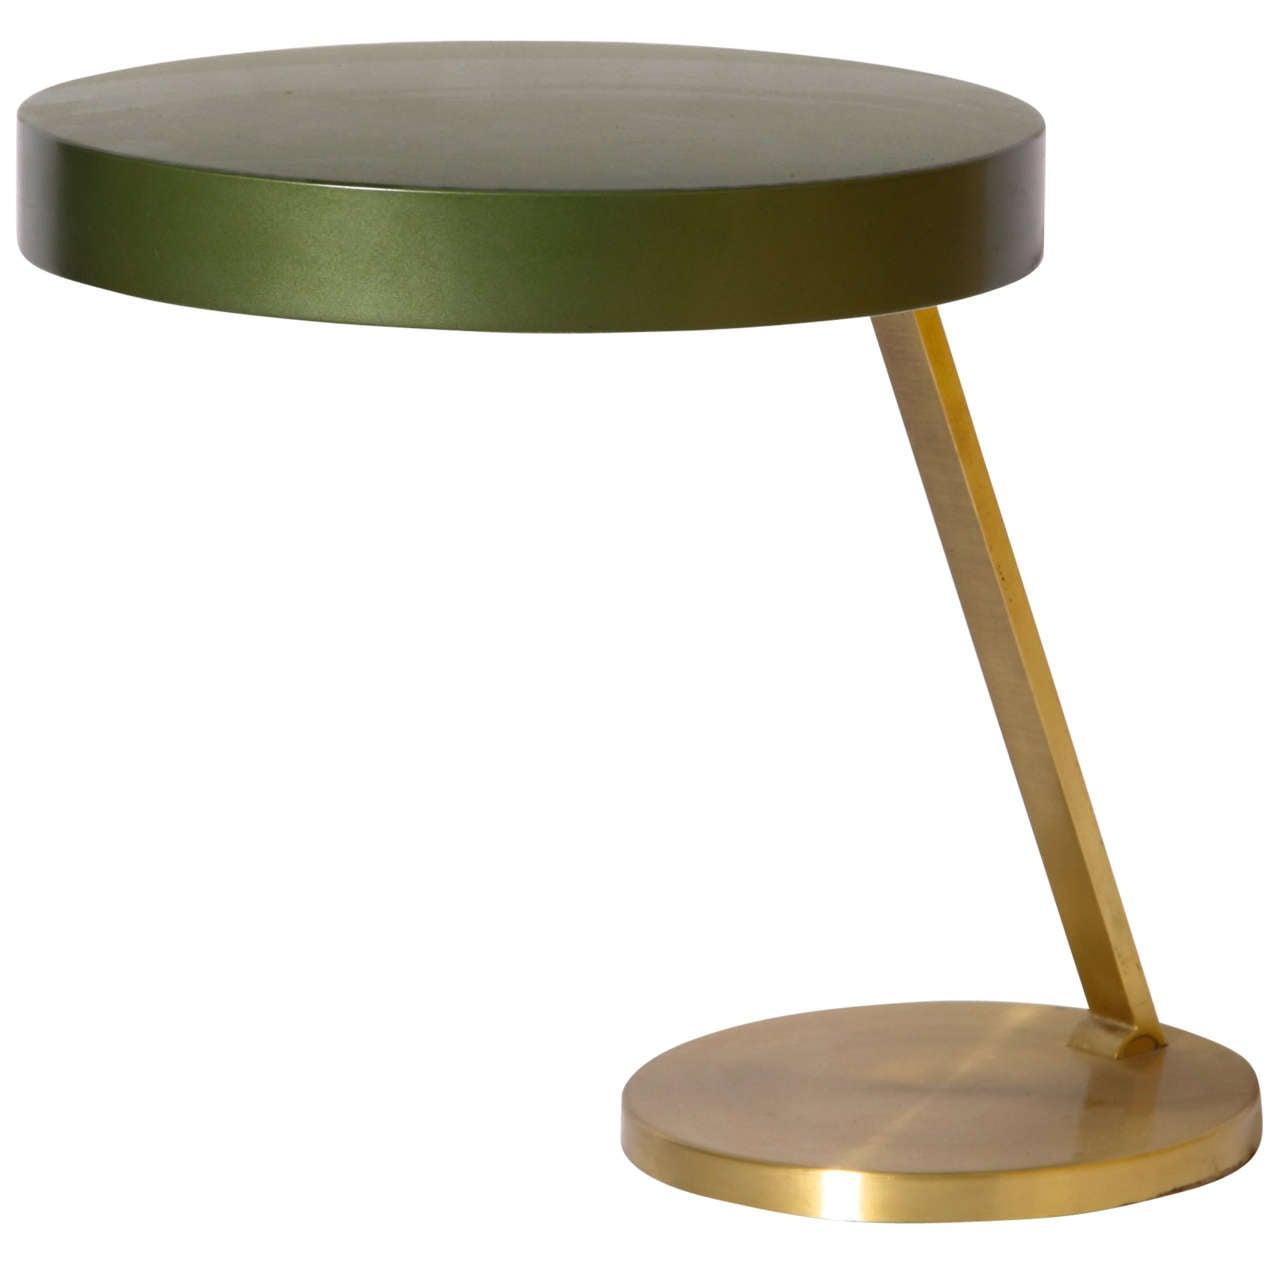 christian dell kaiser idell office or desk lamp. Black Bedroom Furniture Sets. Home Design Ideas